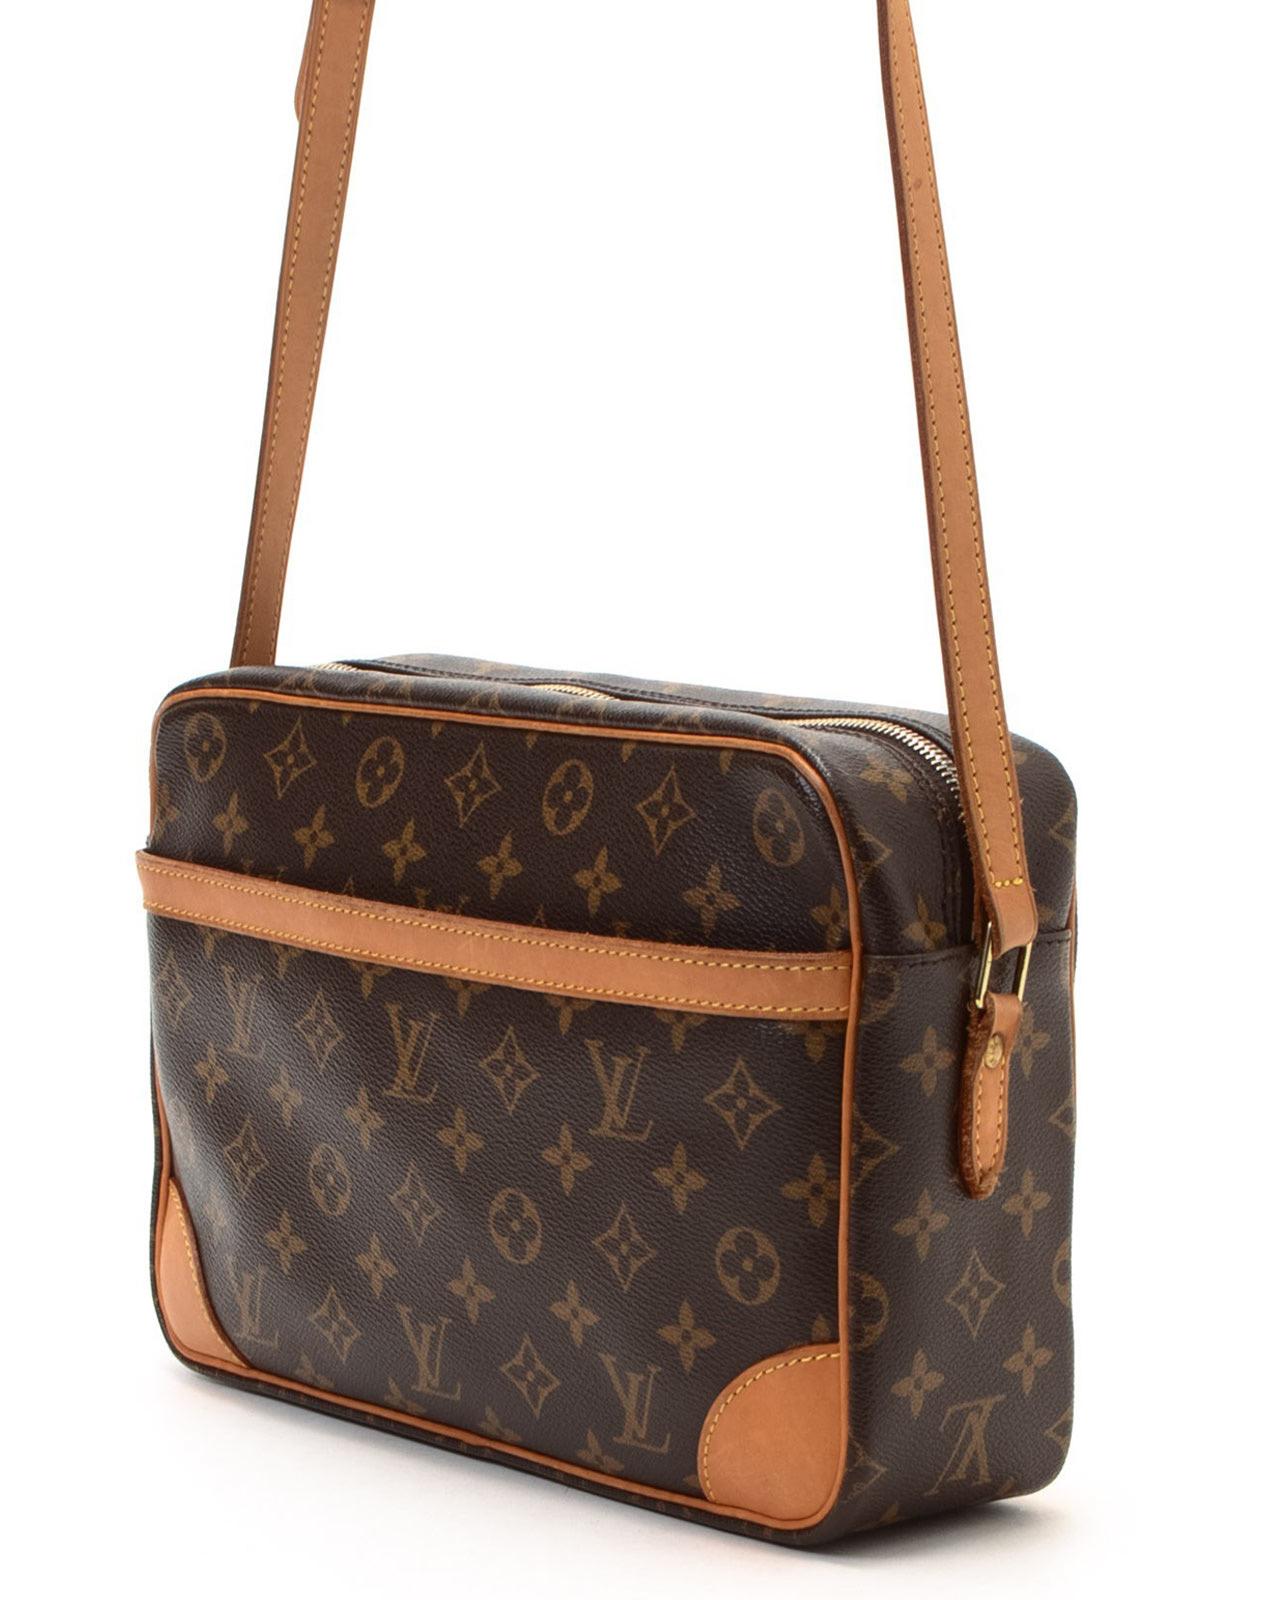 76b382e2a133 Lyst - Louis Vuitton Trocadero 30 Crossbody in Brown